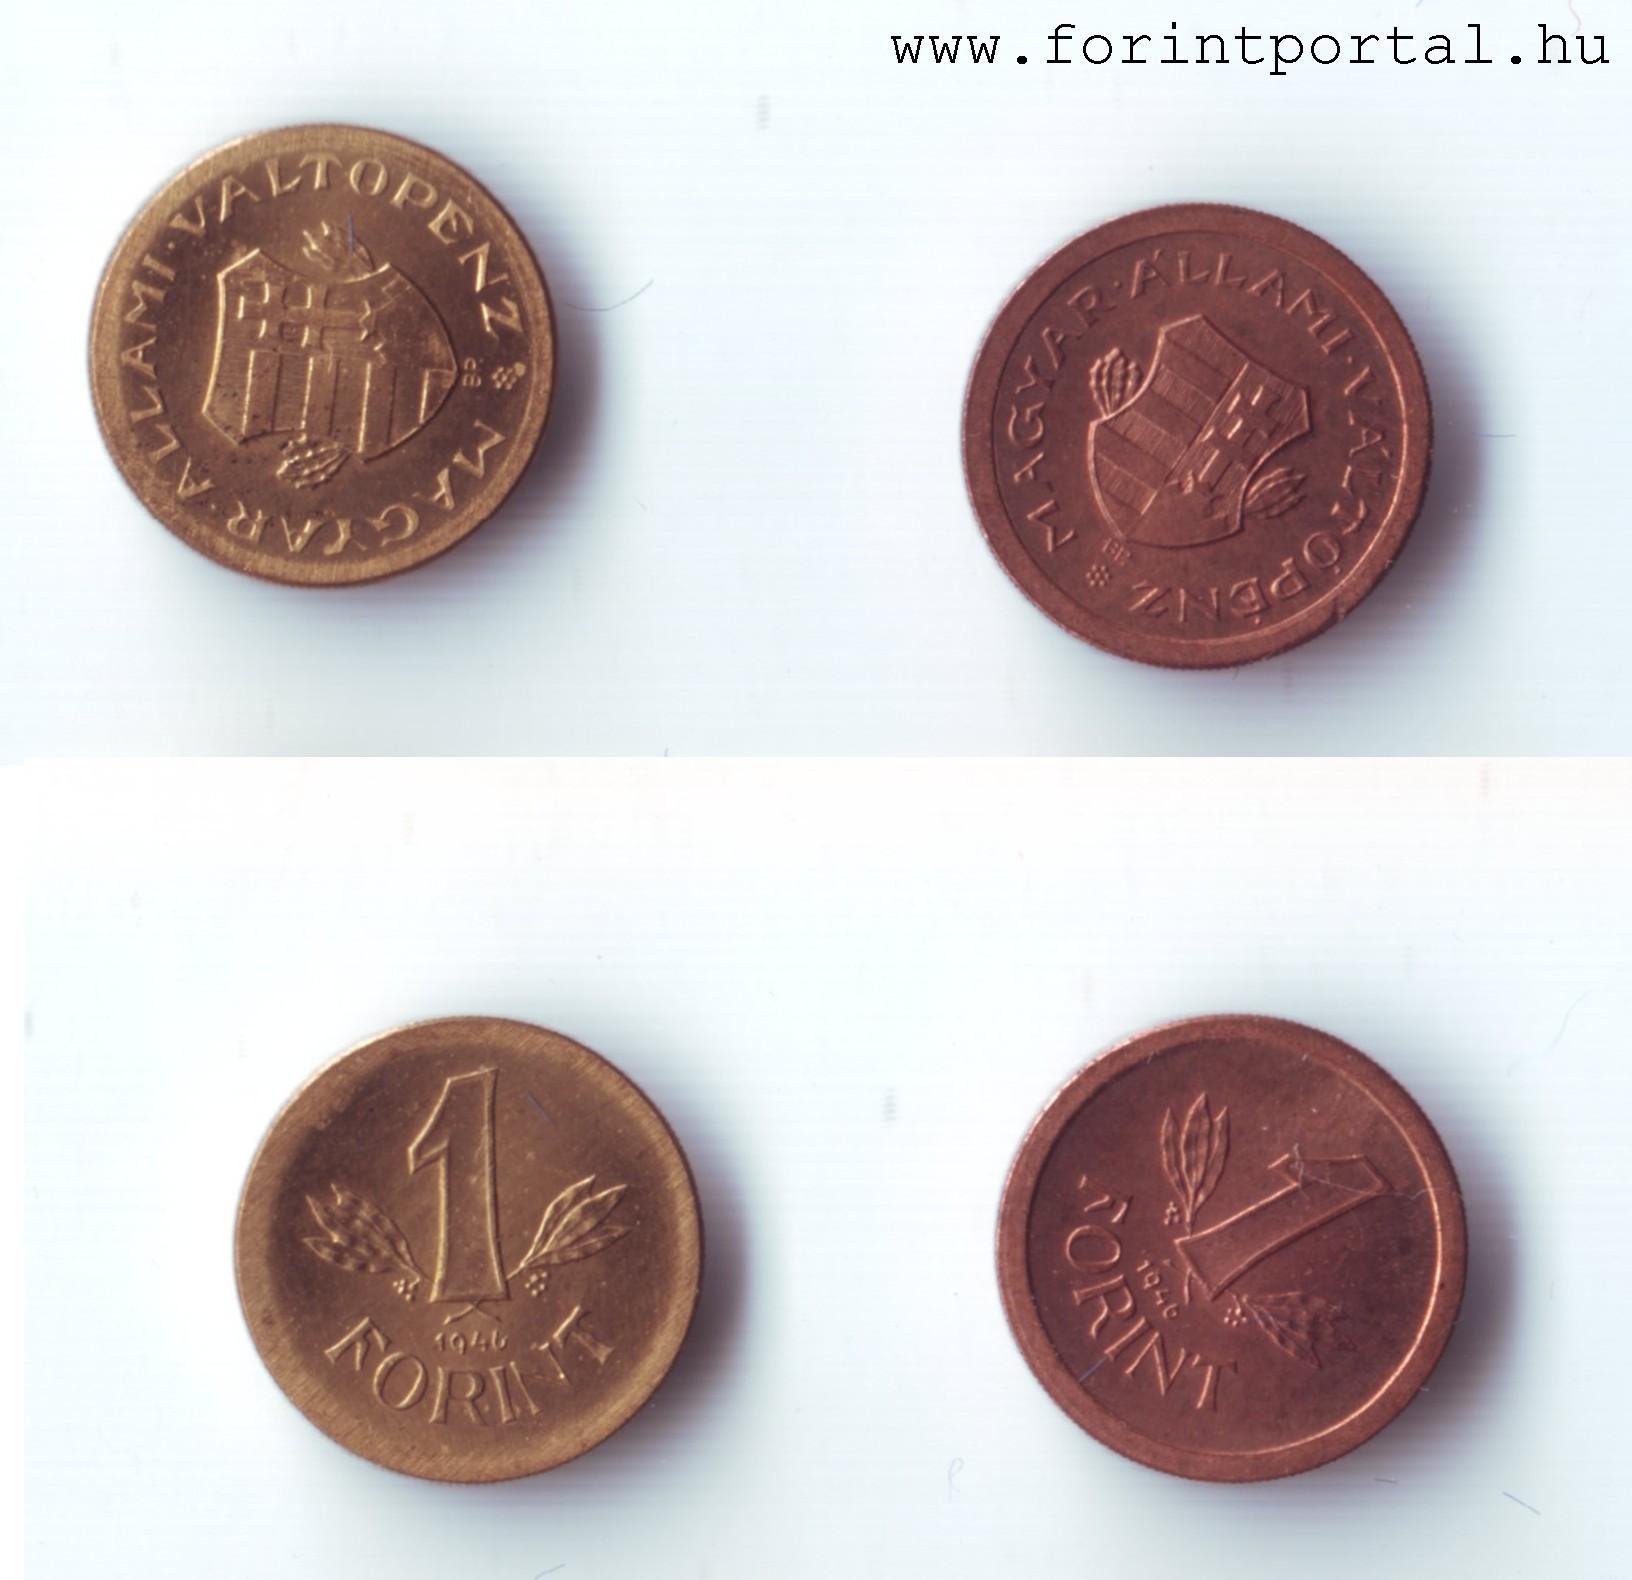 http://www.forintportal.hu/hirek/mini_1-forintos_ermek/mini_1-forintos_ermek_1946vorosrez_es_sargarez_1ft.jpg